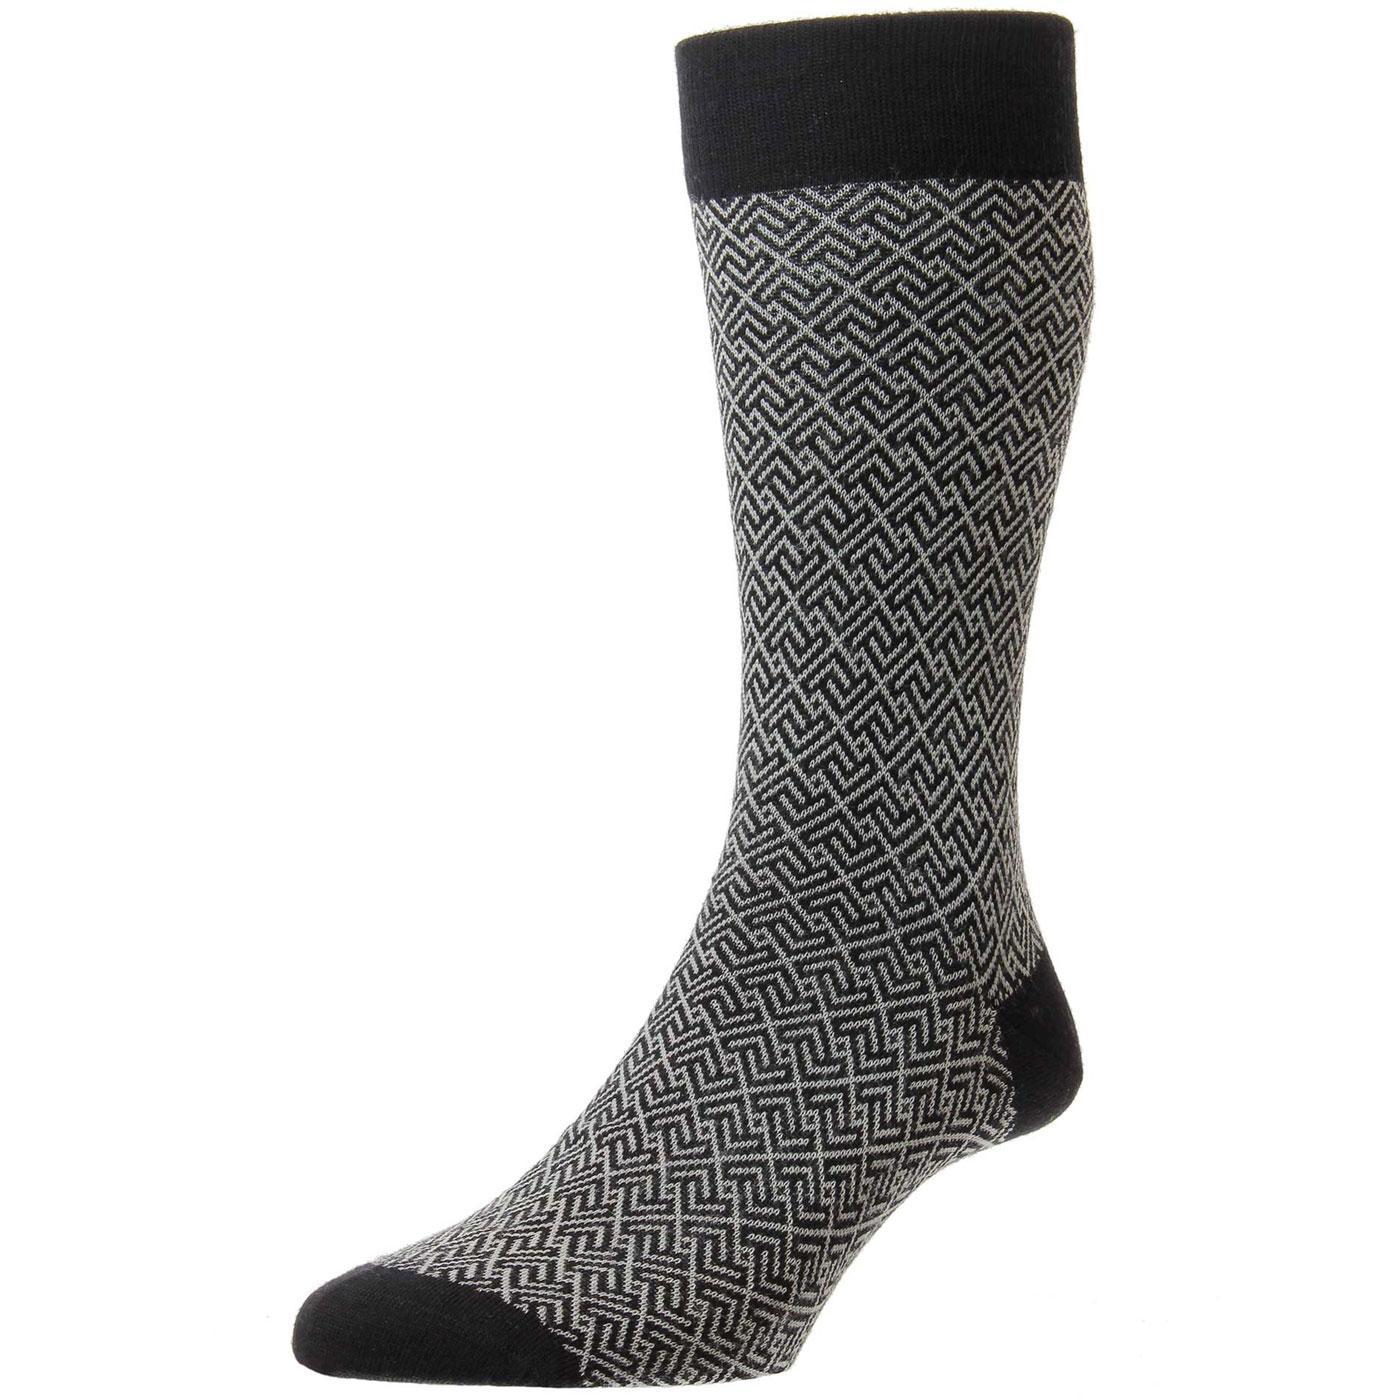 + Porter PANTHERELLA Men's Mod Pattern Socks B